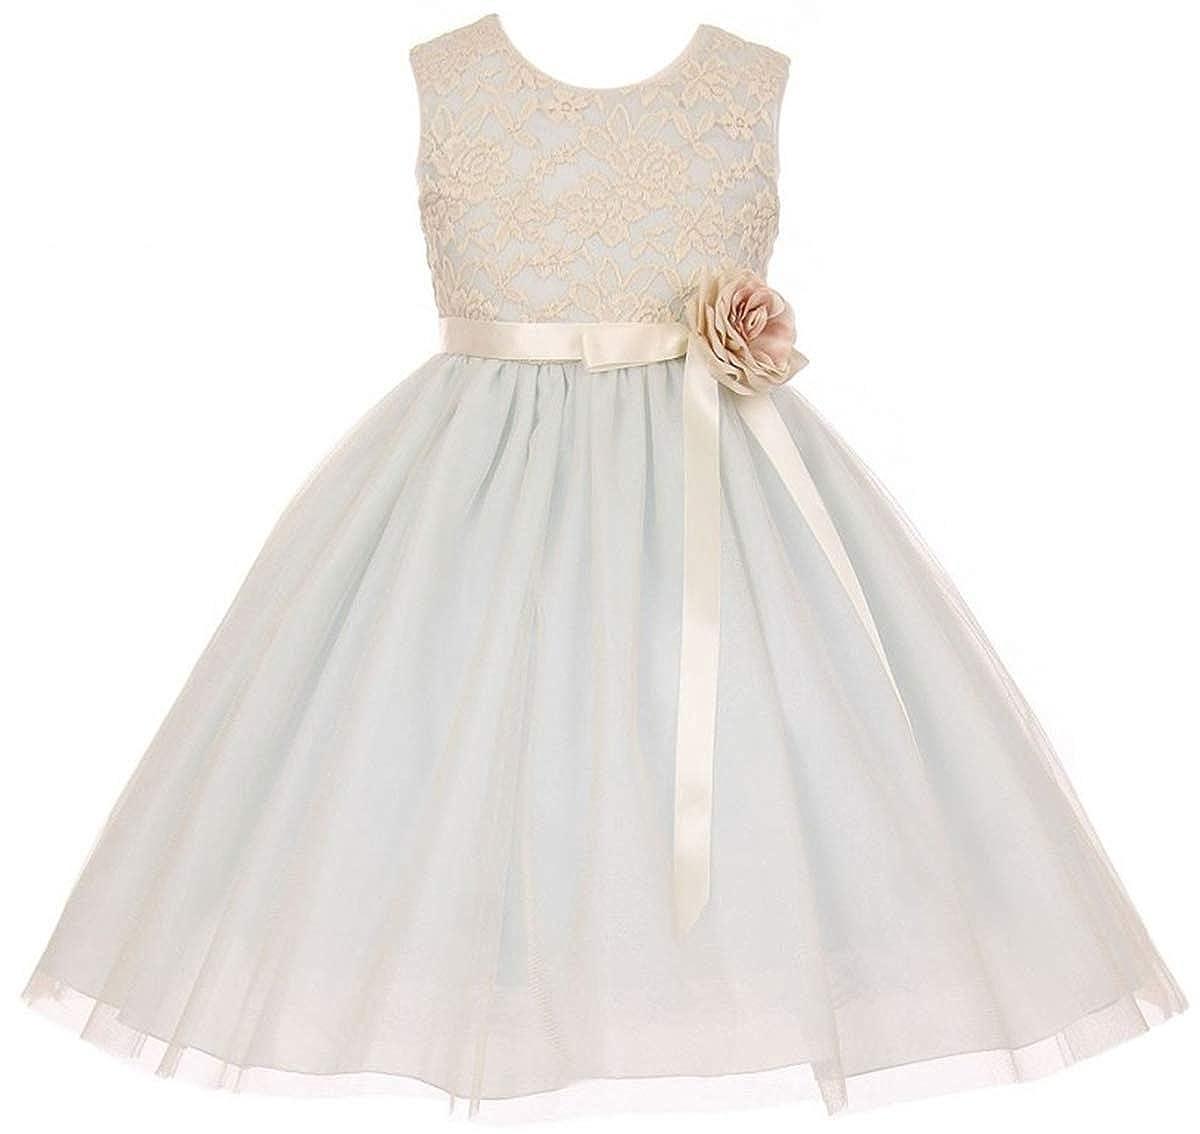 0ca57528500 Amazon.com  Little Girls Elegant Contrast 3D Lace Tulle Easter Graduation  Flower Girl Dress  Clothing